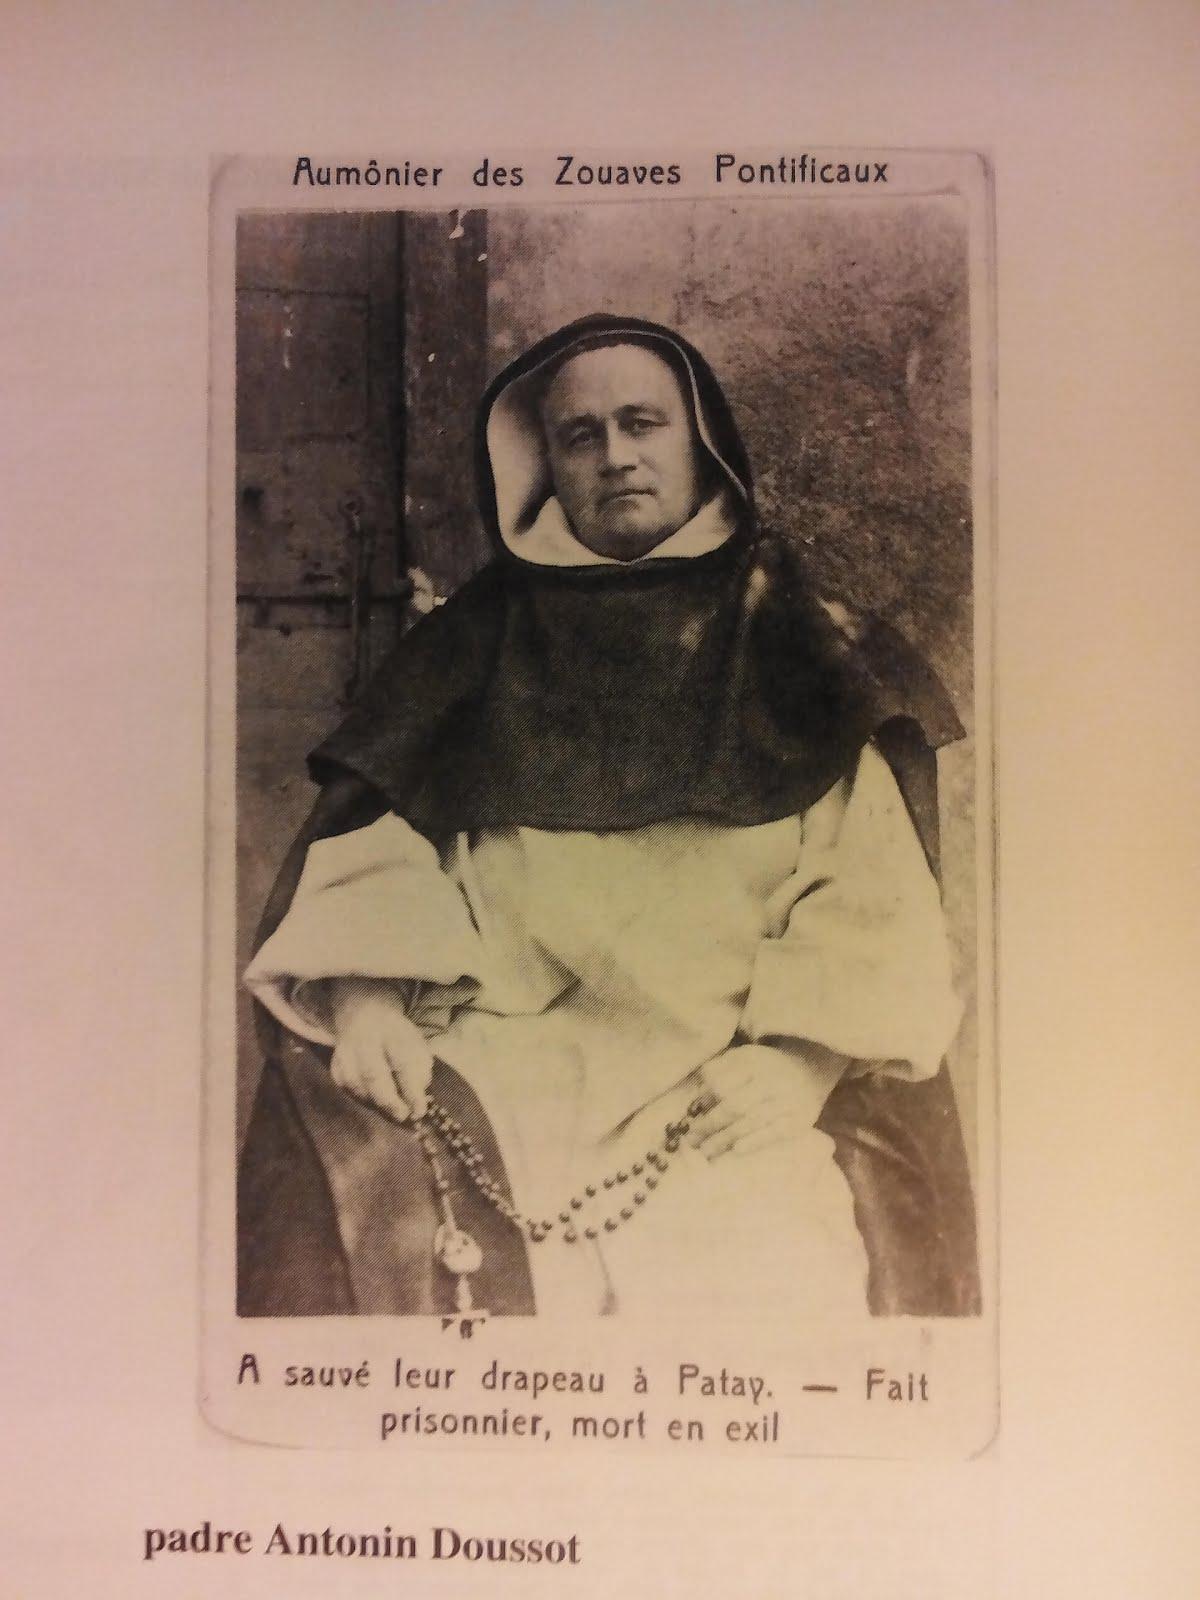 Padre Antonin Doussot